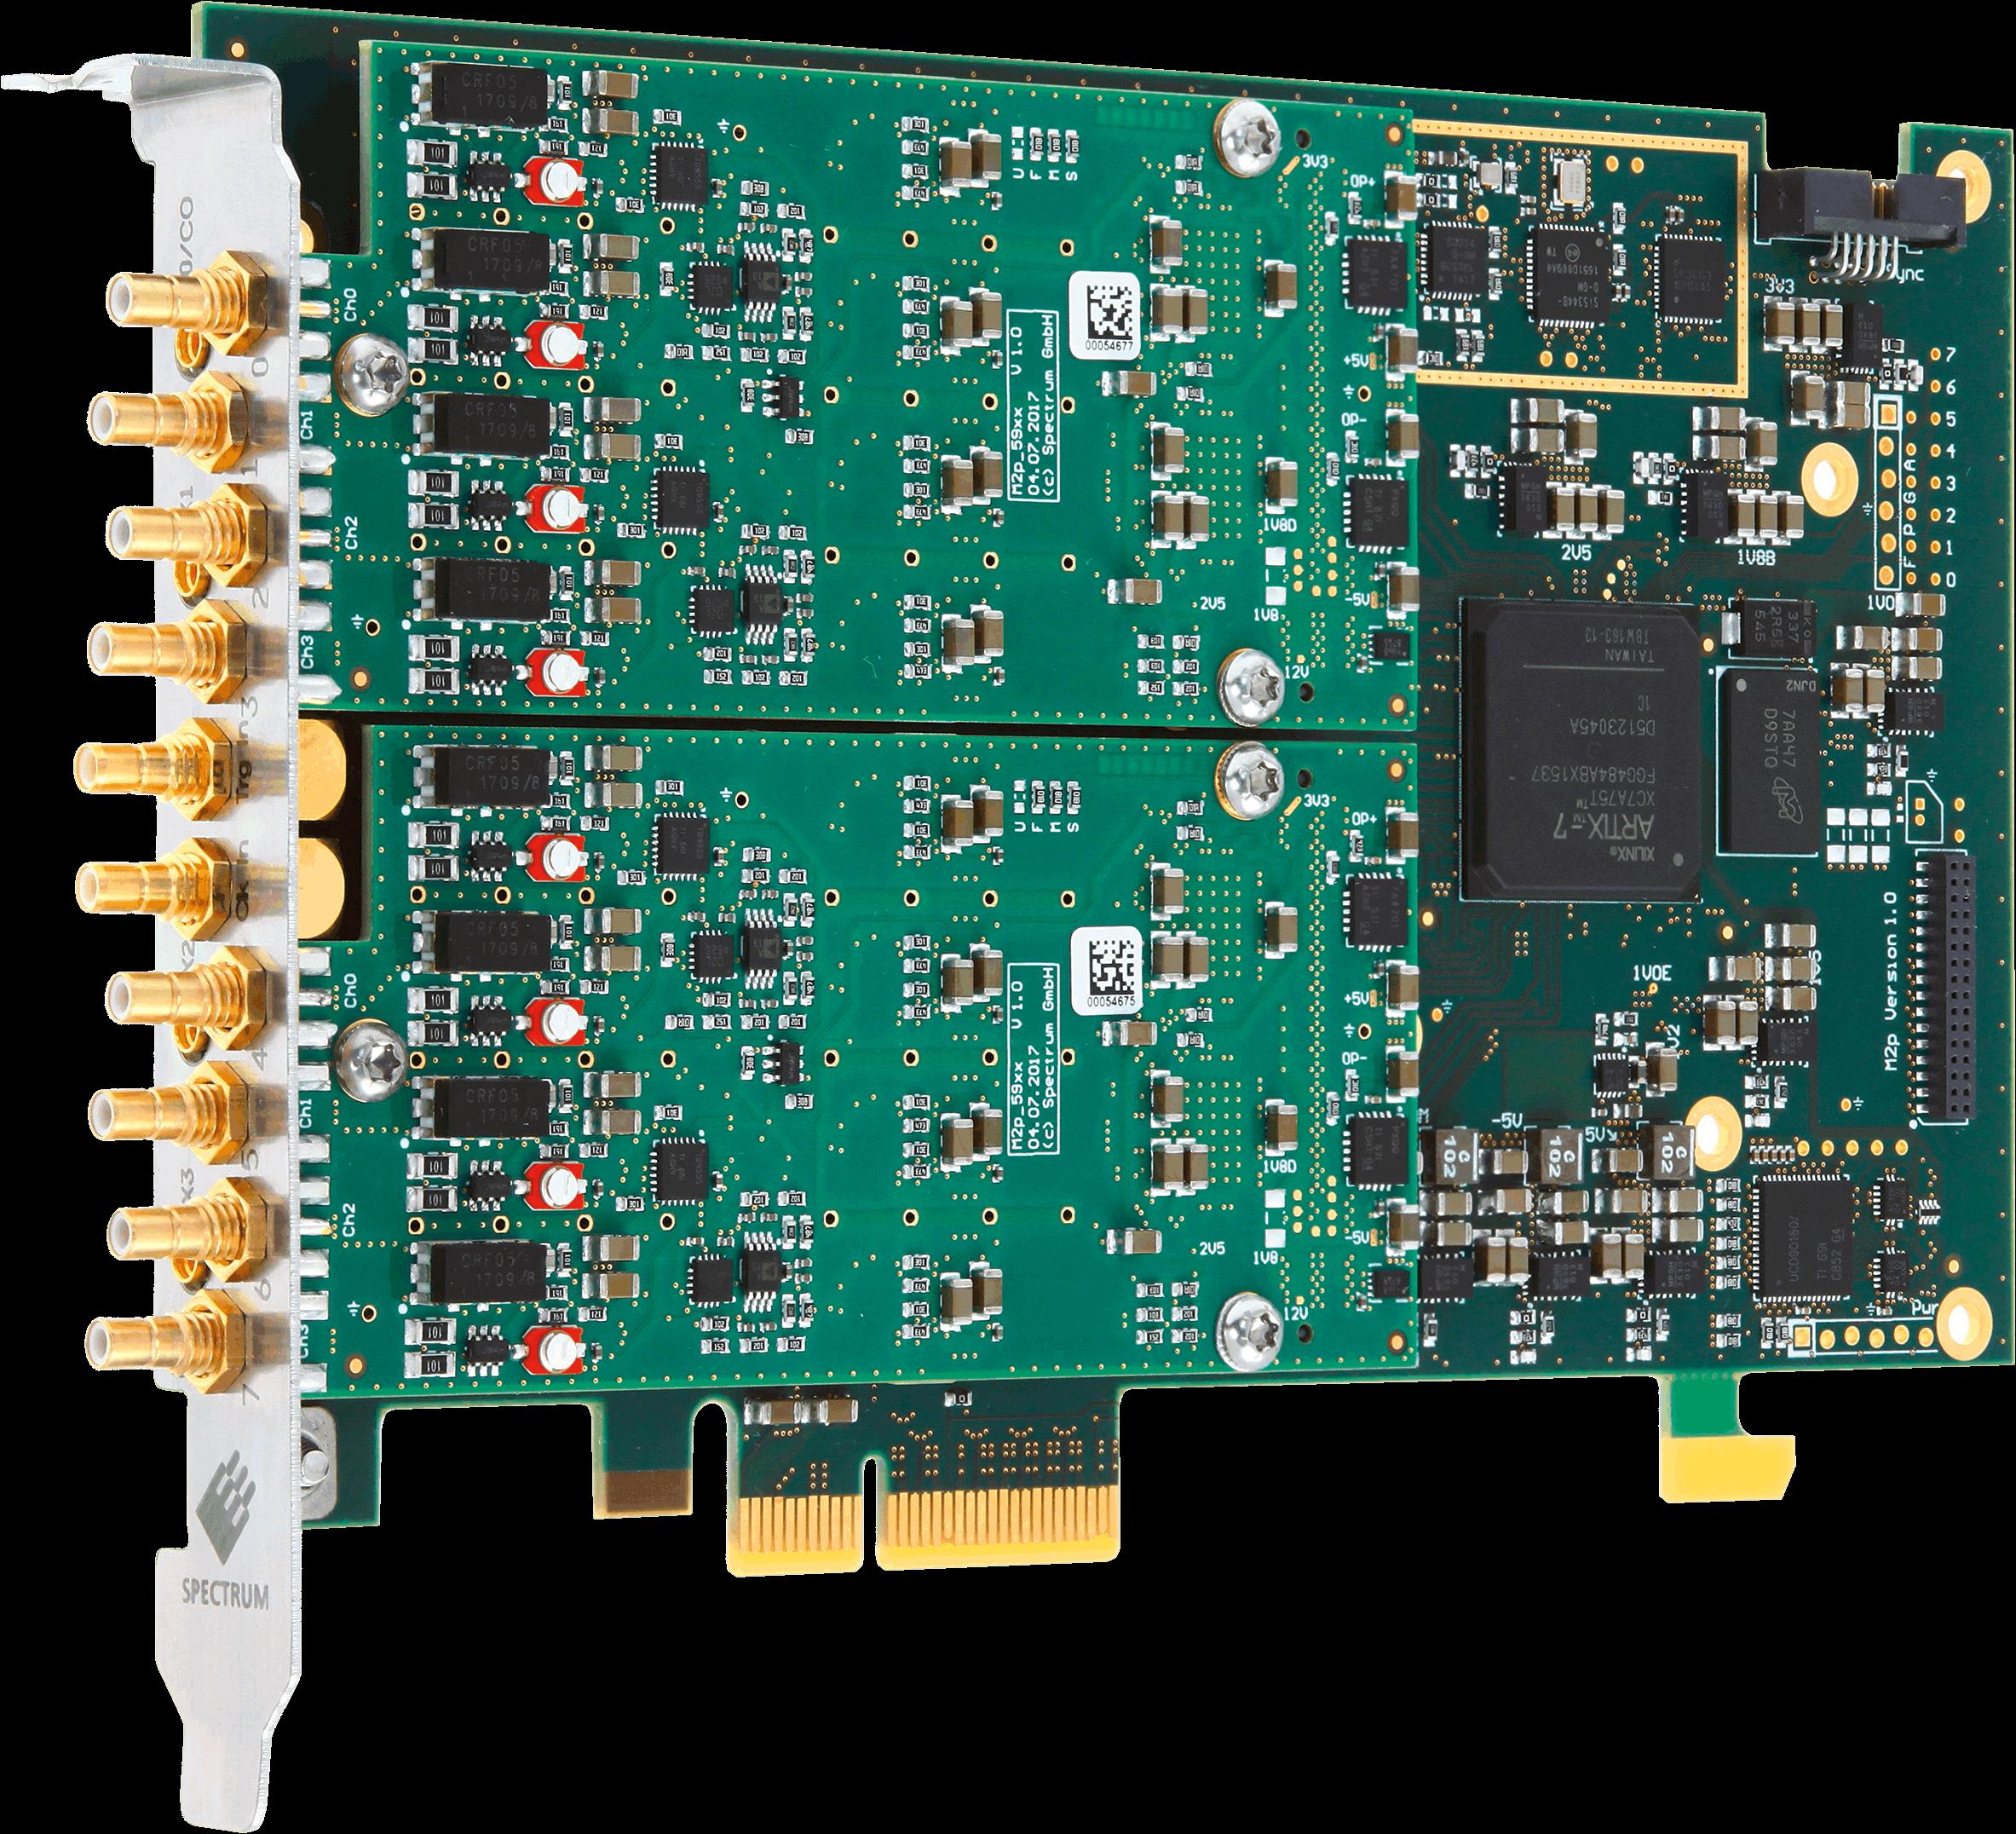 Spectrum仪器通用数字化仪提速50%,采样率高达125MS/s